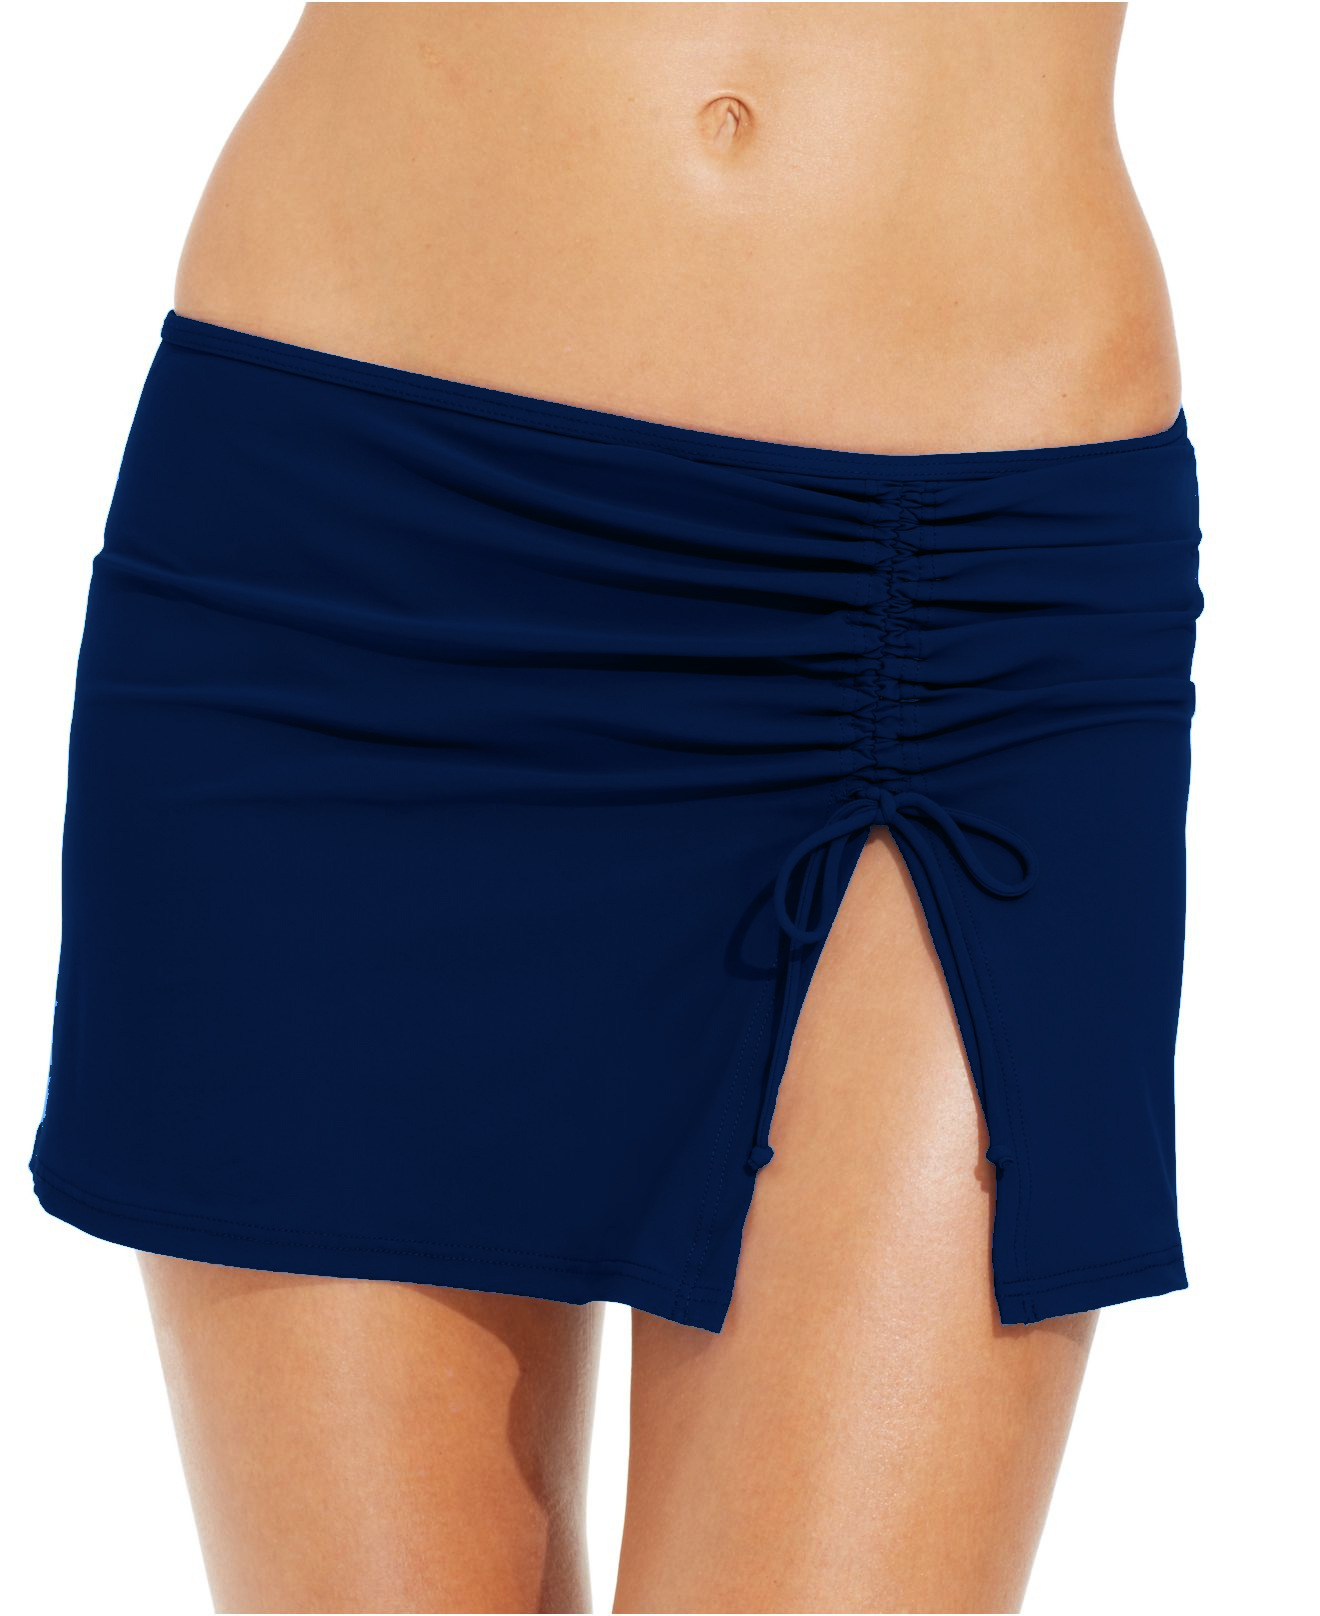 Fashion Hot Selling Swimdress Beach Skirt Lining Swimming Trunks Bathing Suit